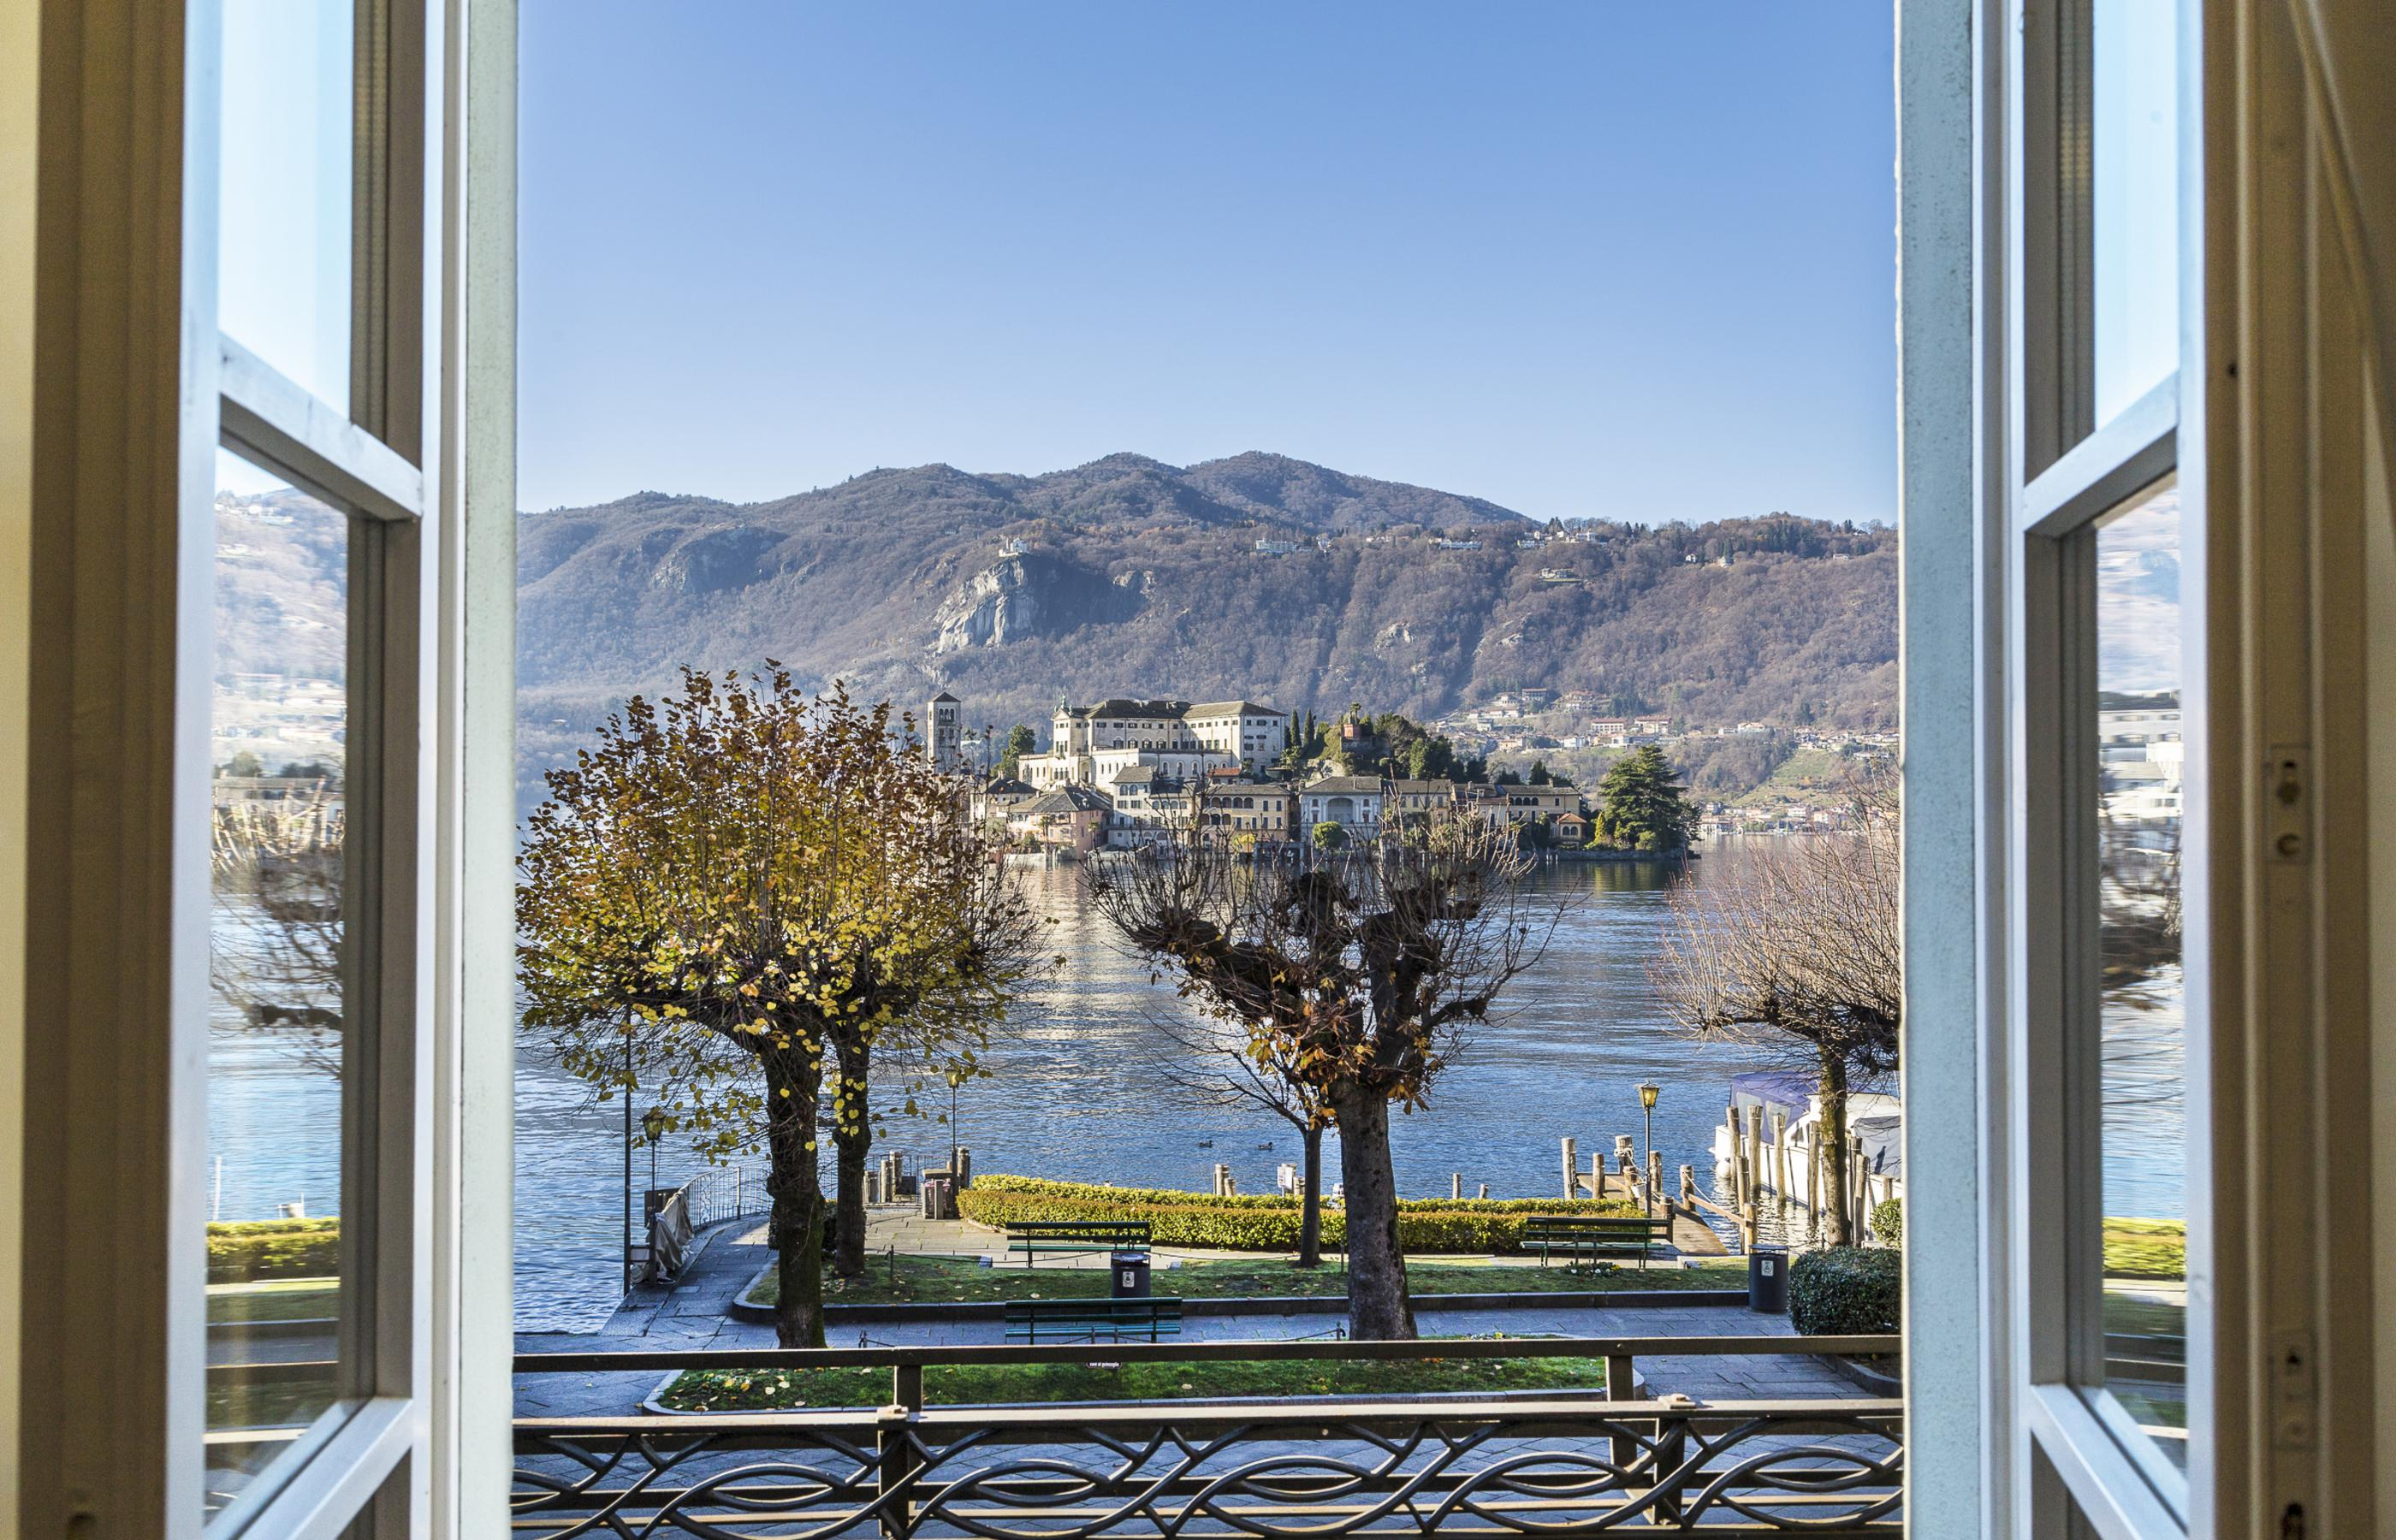 The holiday homes of Lake Orta